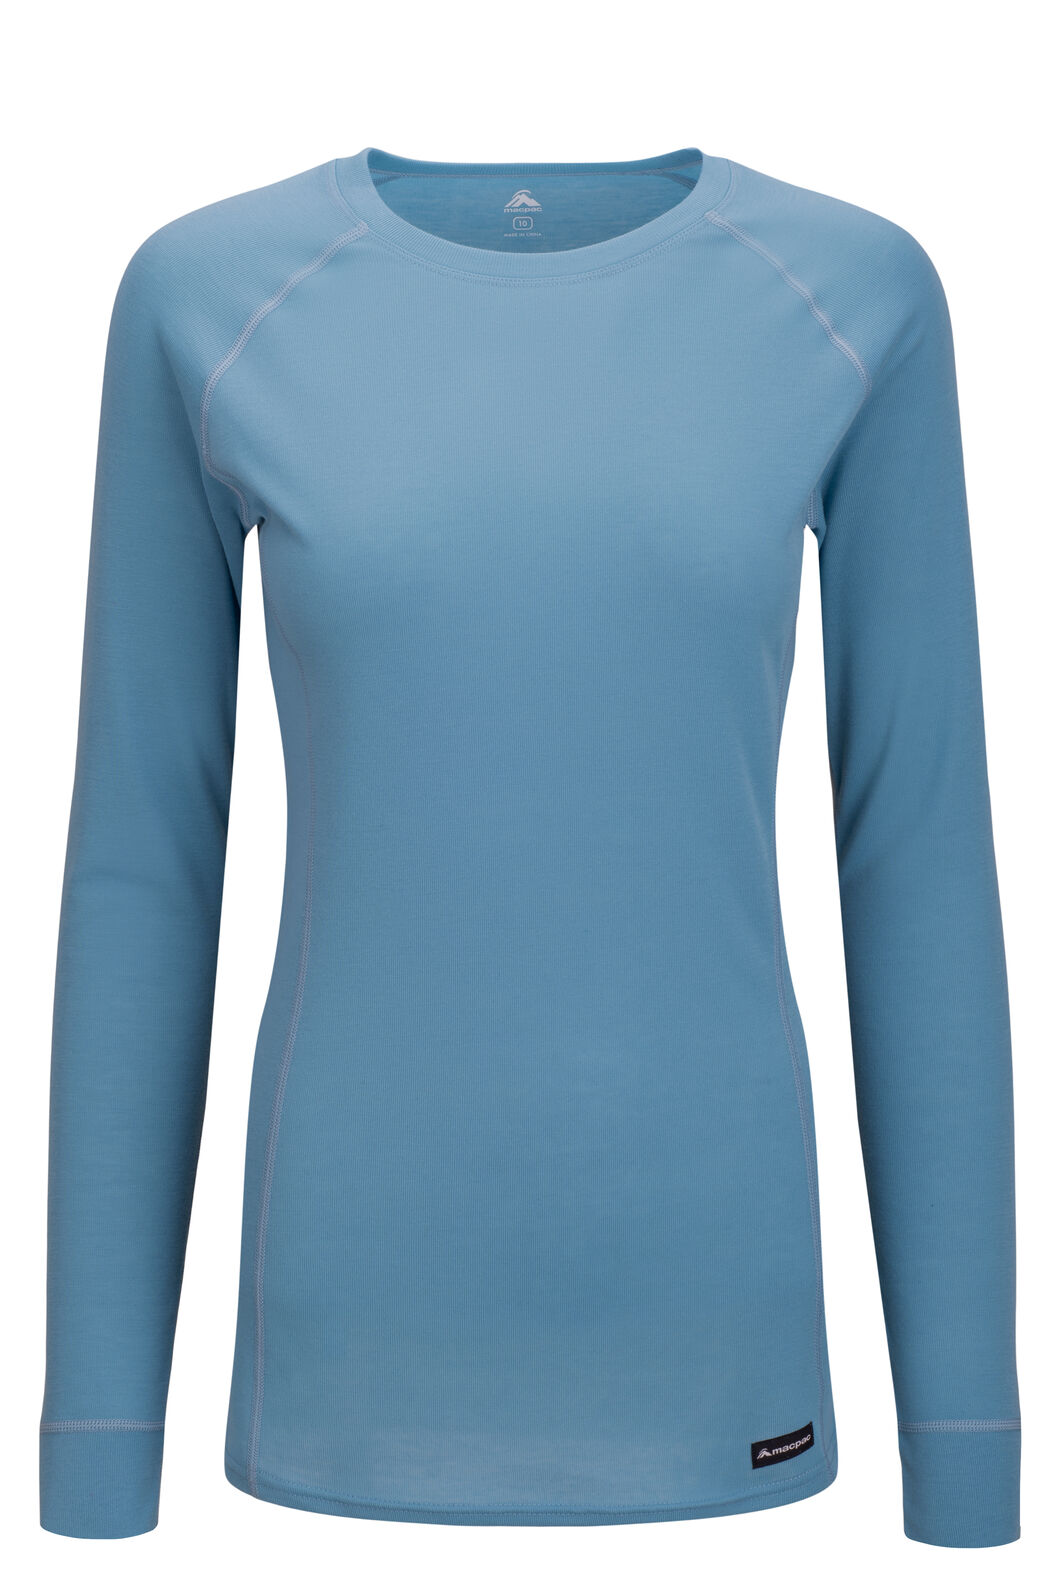 Macpac Women's Geothermal Long Sleeve Top, Delphinium, hi-res